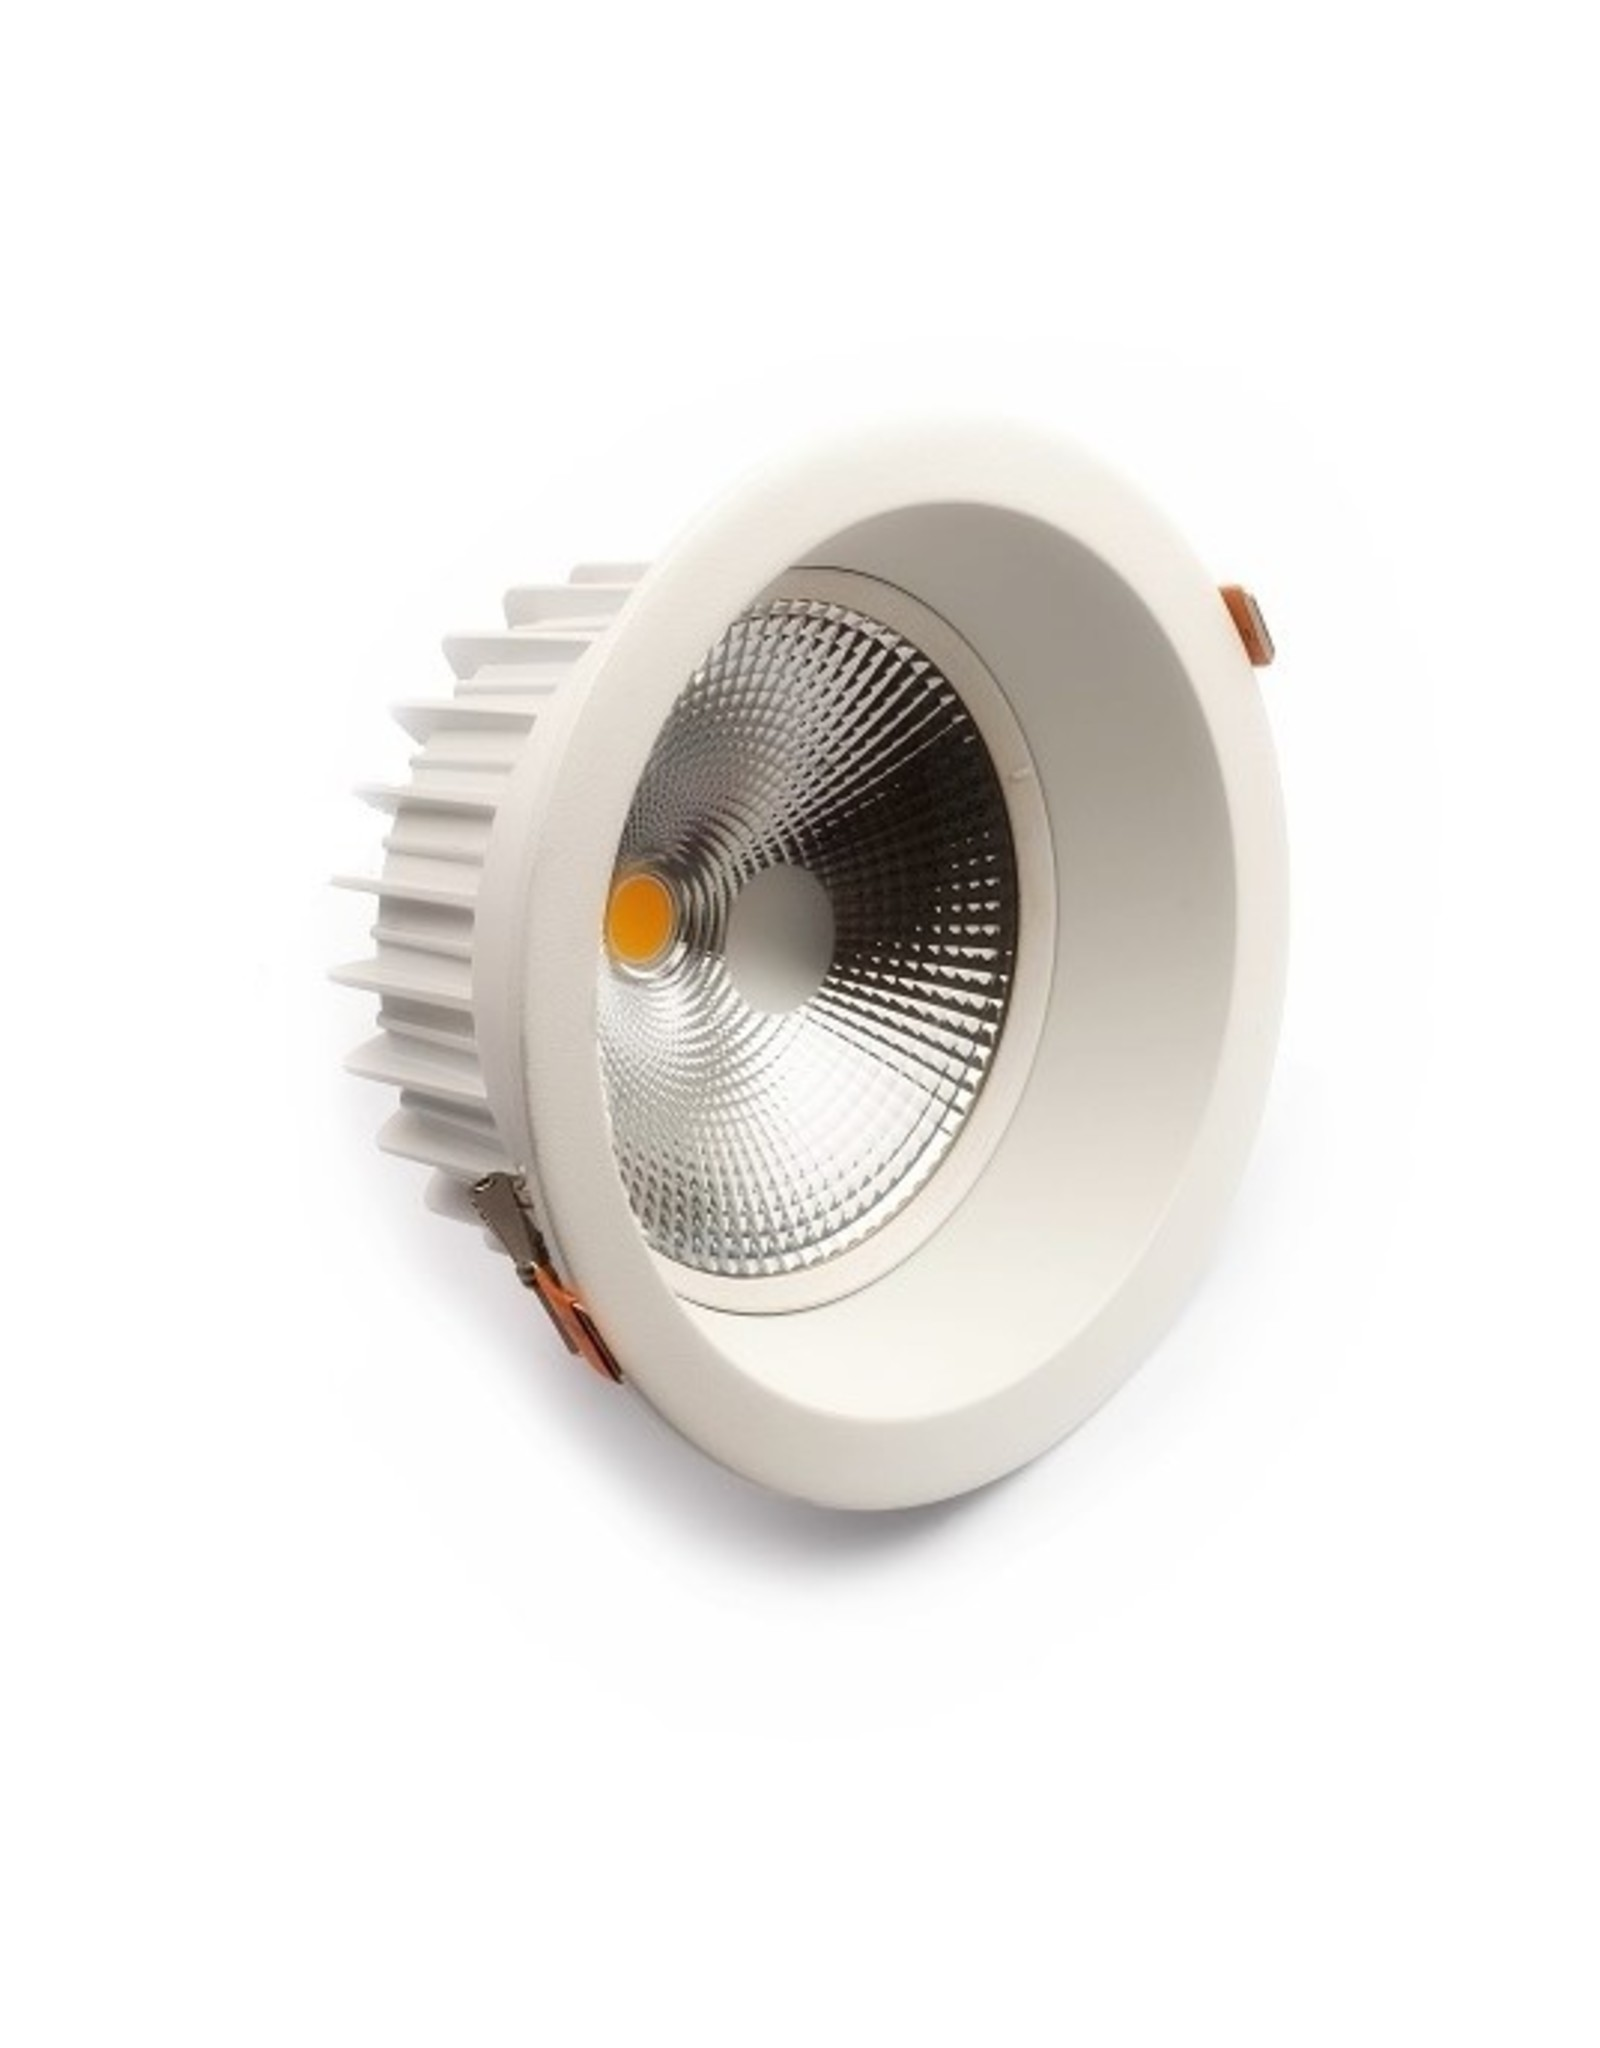 LedLed Glare Dowlight 4000k 230mm 8-35W gatmaat 195mm